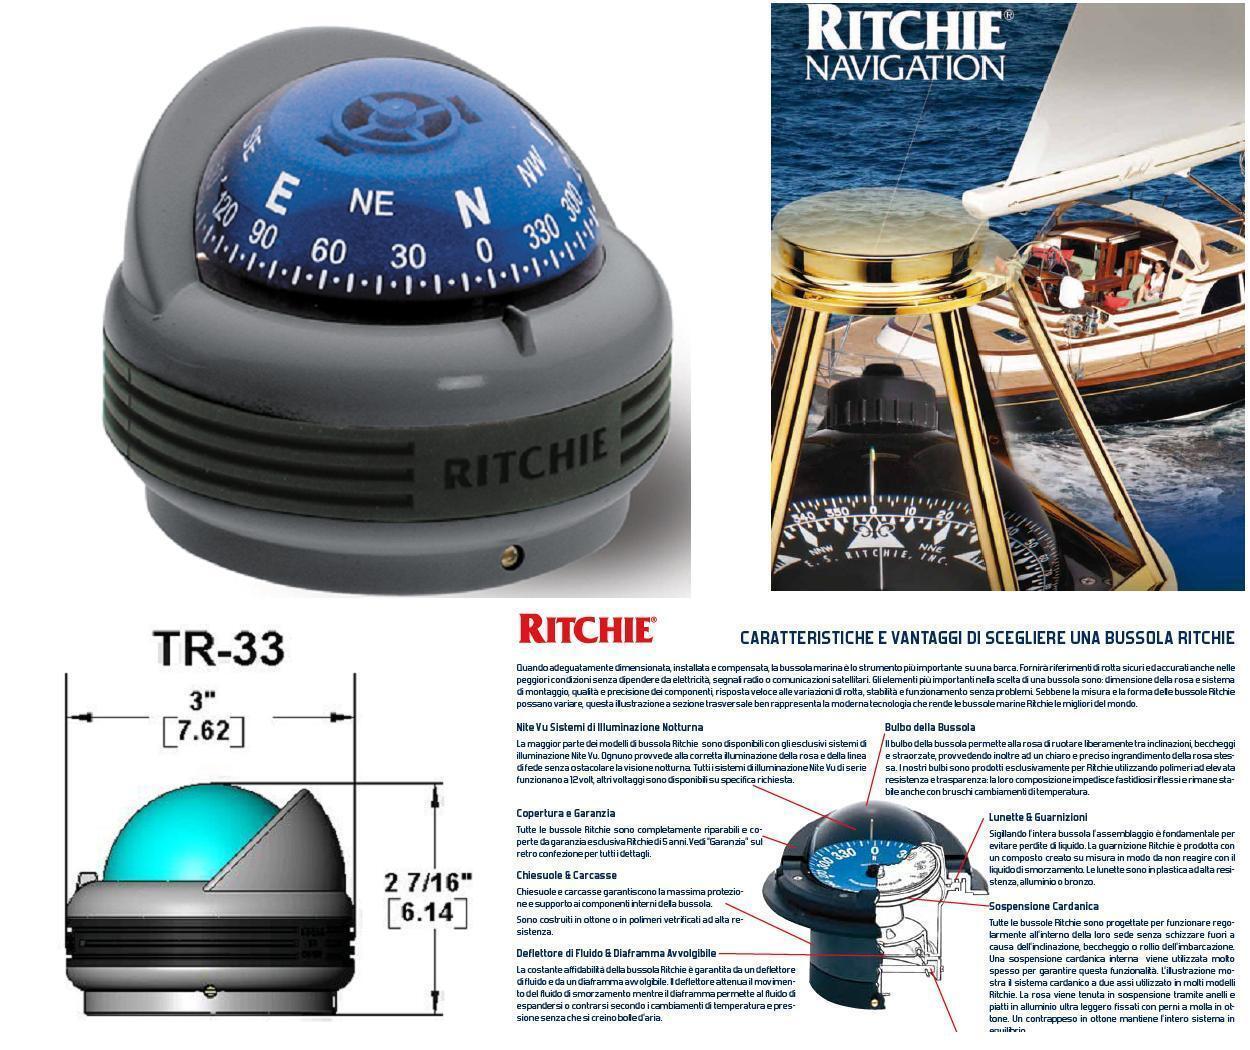 RITCHIE Kompass Stiefel Navigation Profi an die Oberfläche Rosa 2  Licht TR-33G